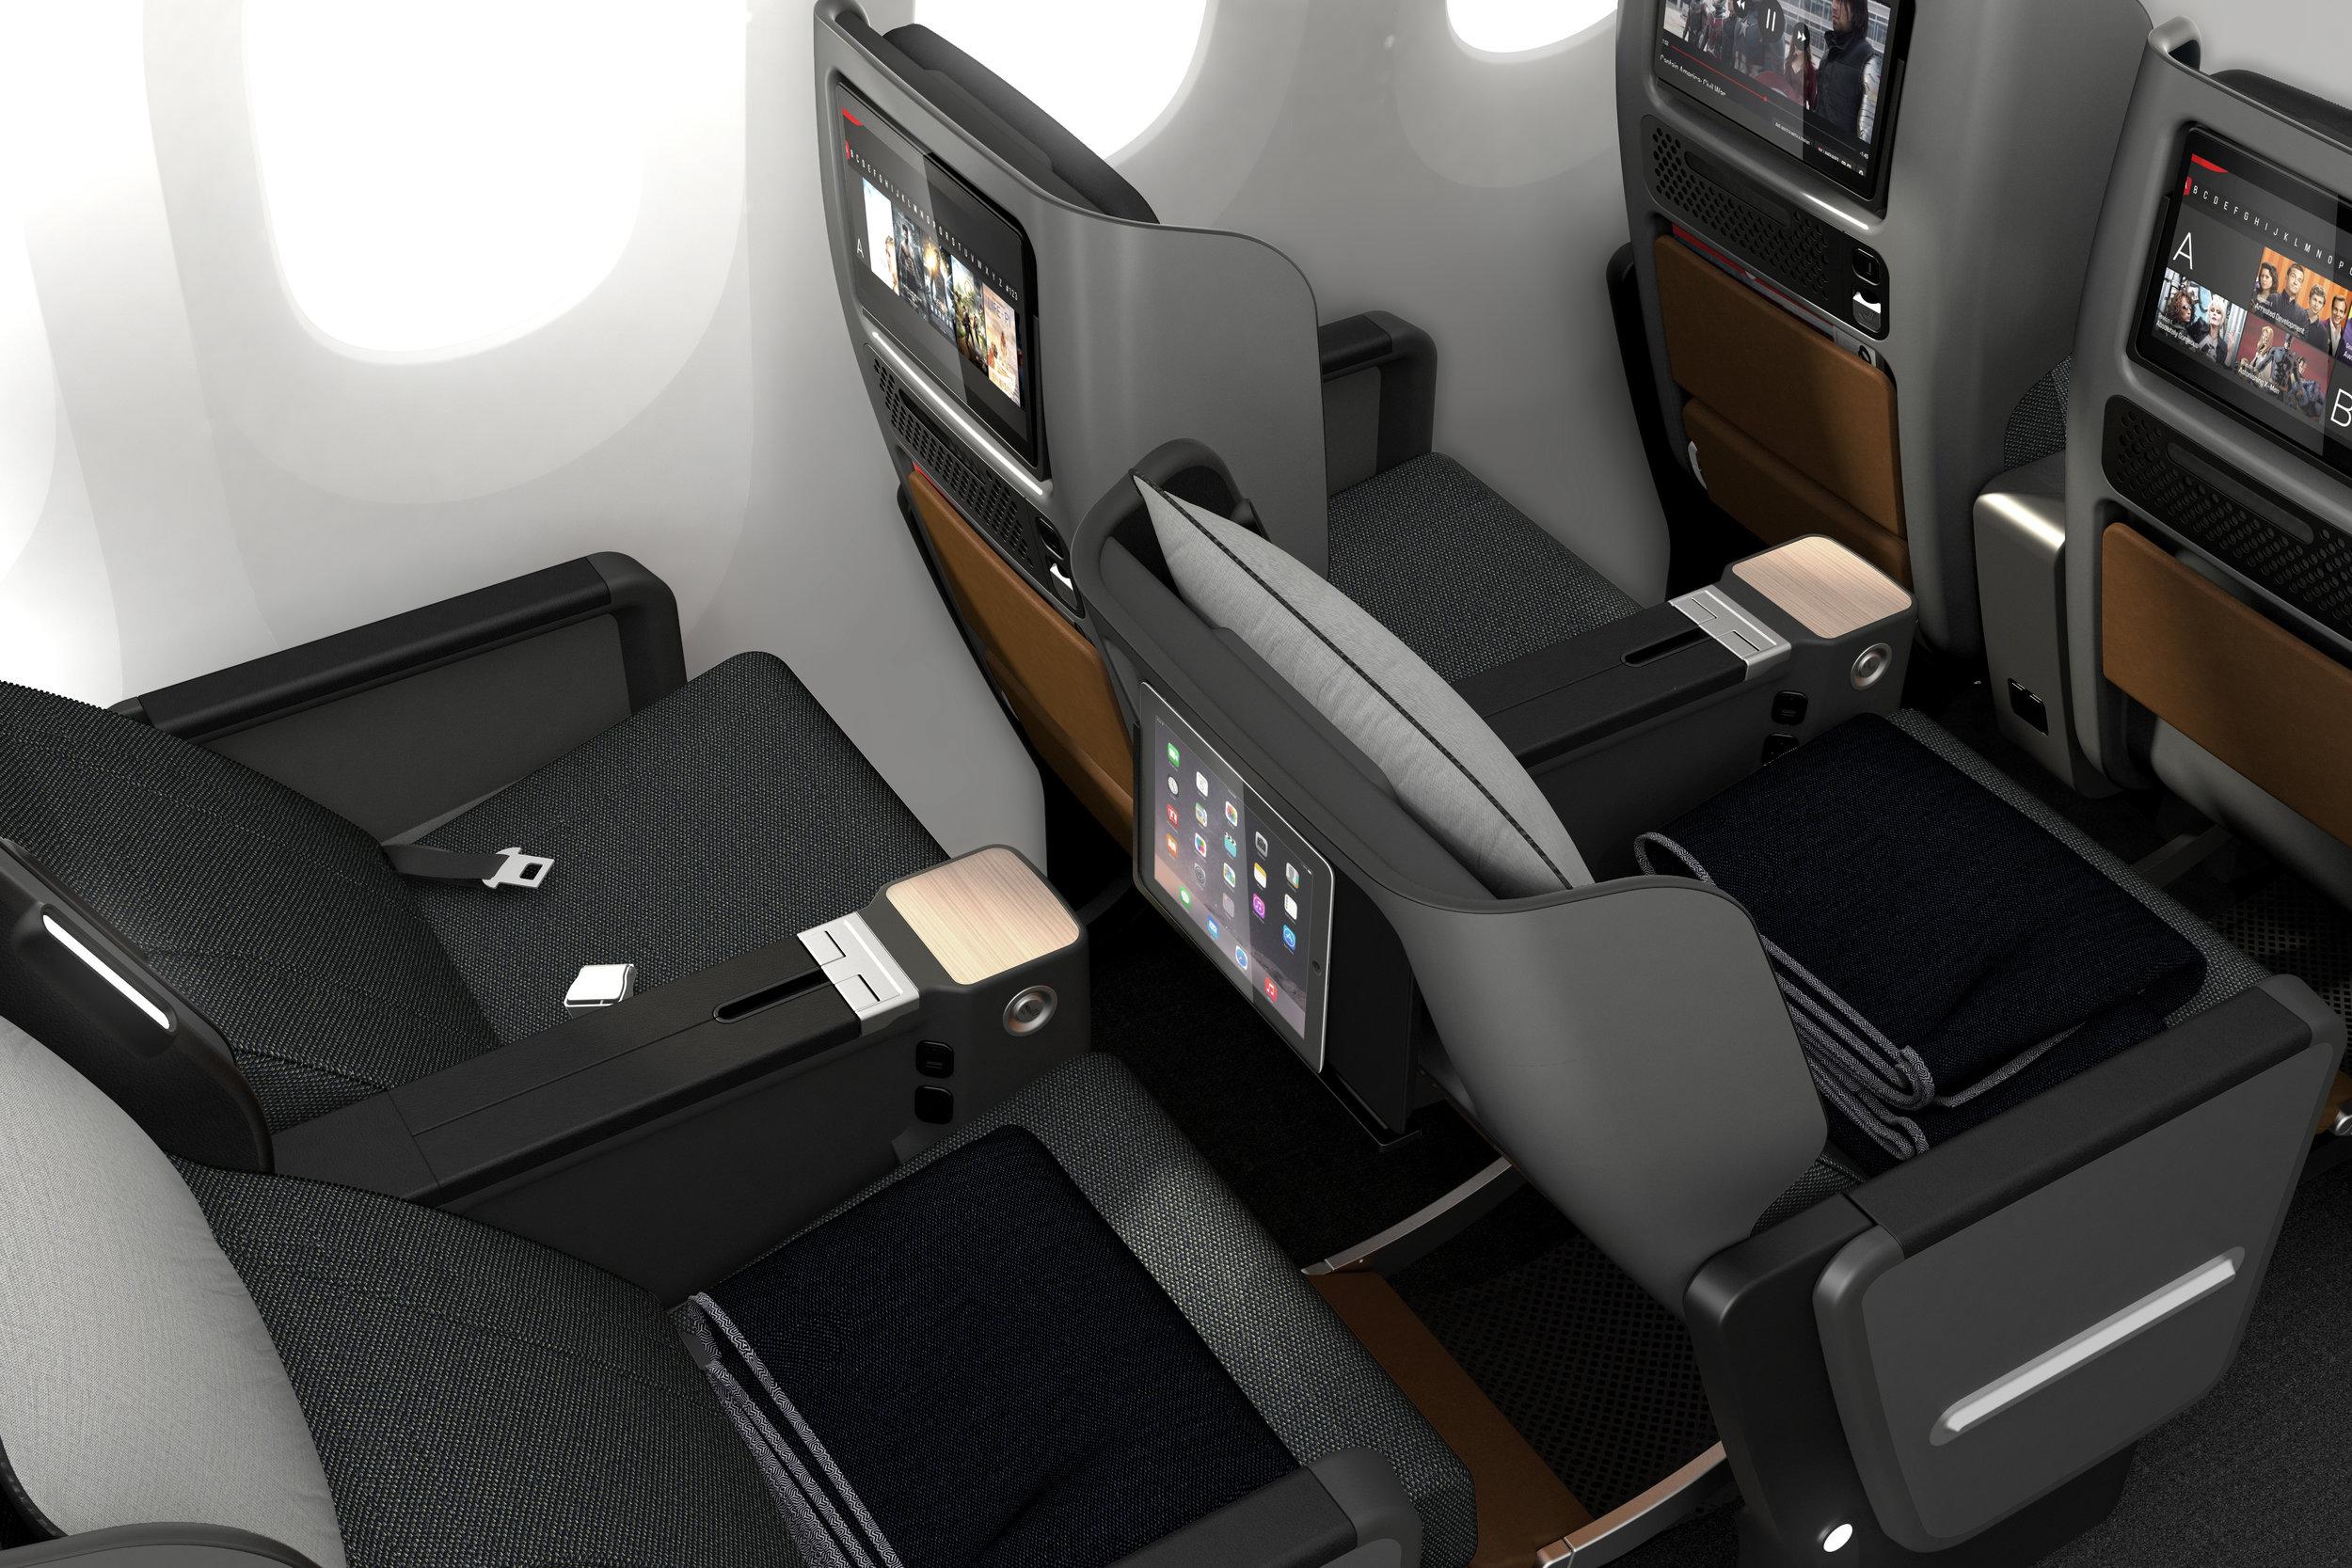 New Premium Economy Seats on Qantas' Dreamliner B787-9 | Photo Credit: Qantas